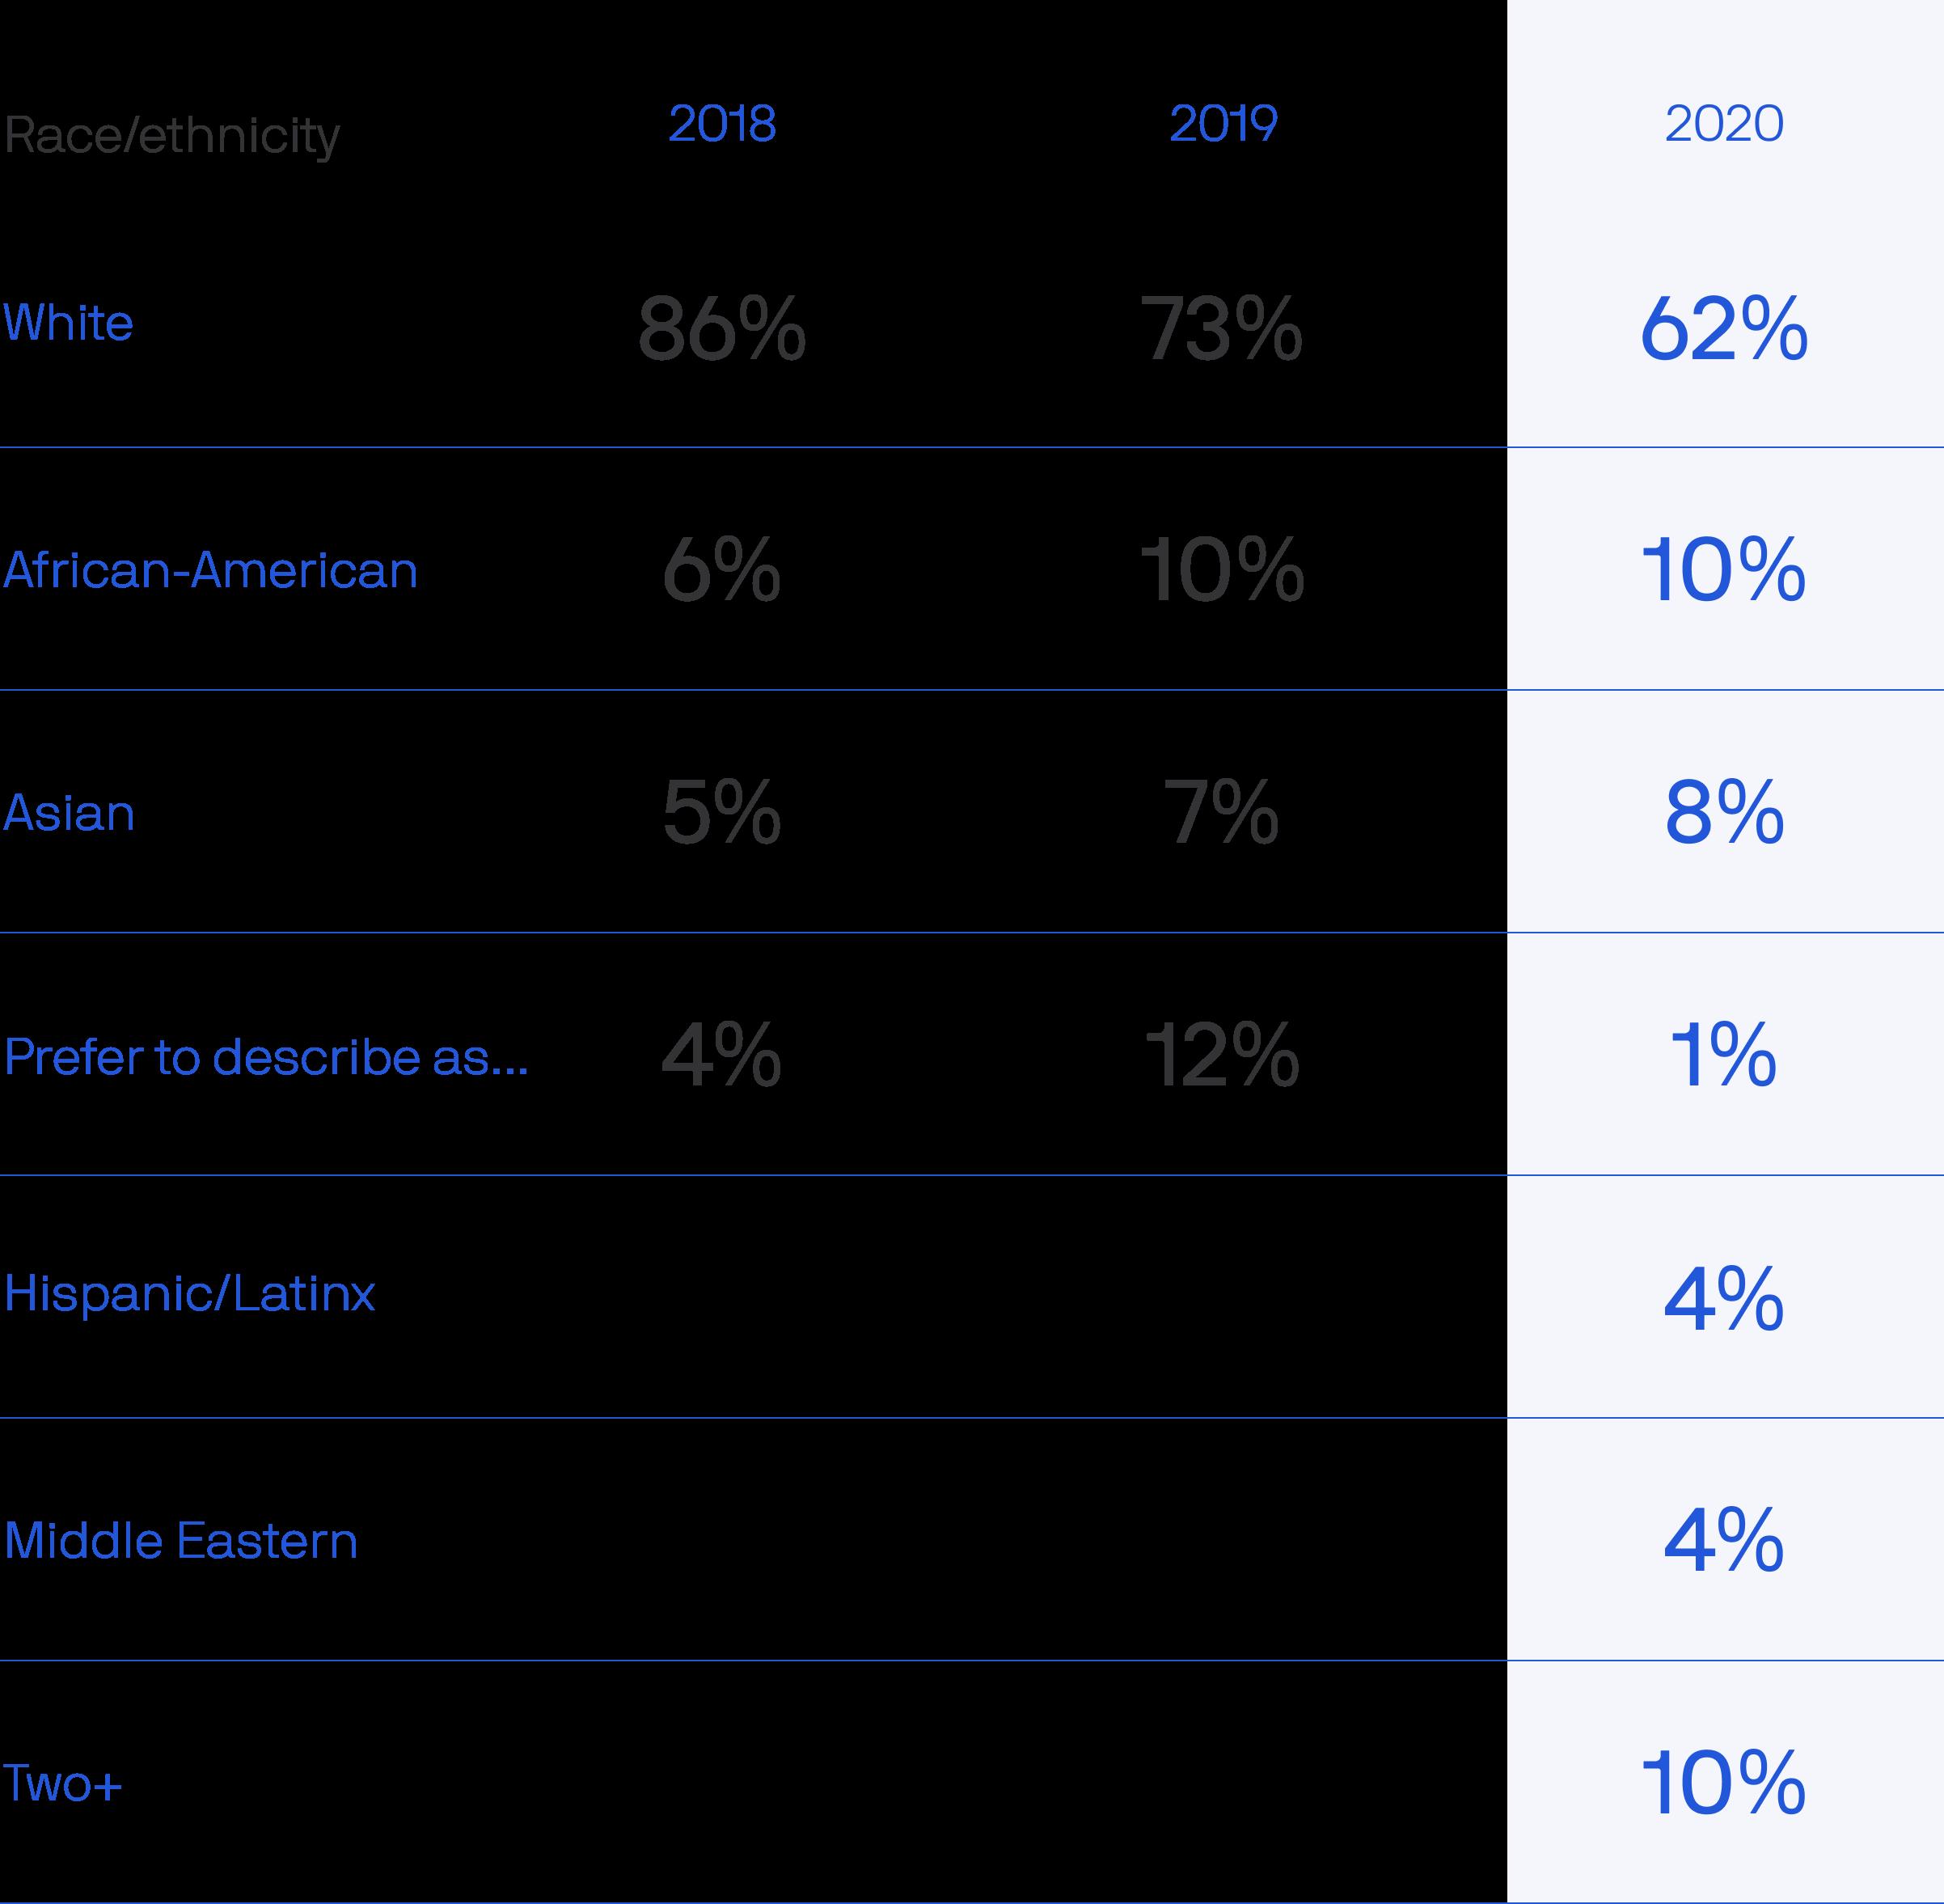 Chart of Axions' race/ethnicity between 2018-2020